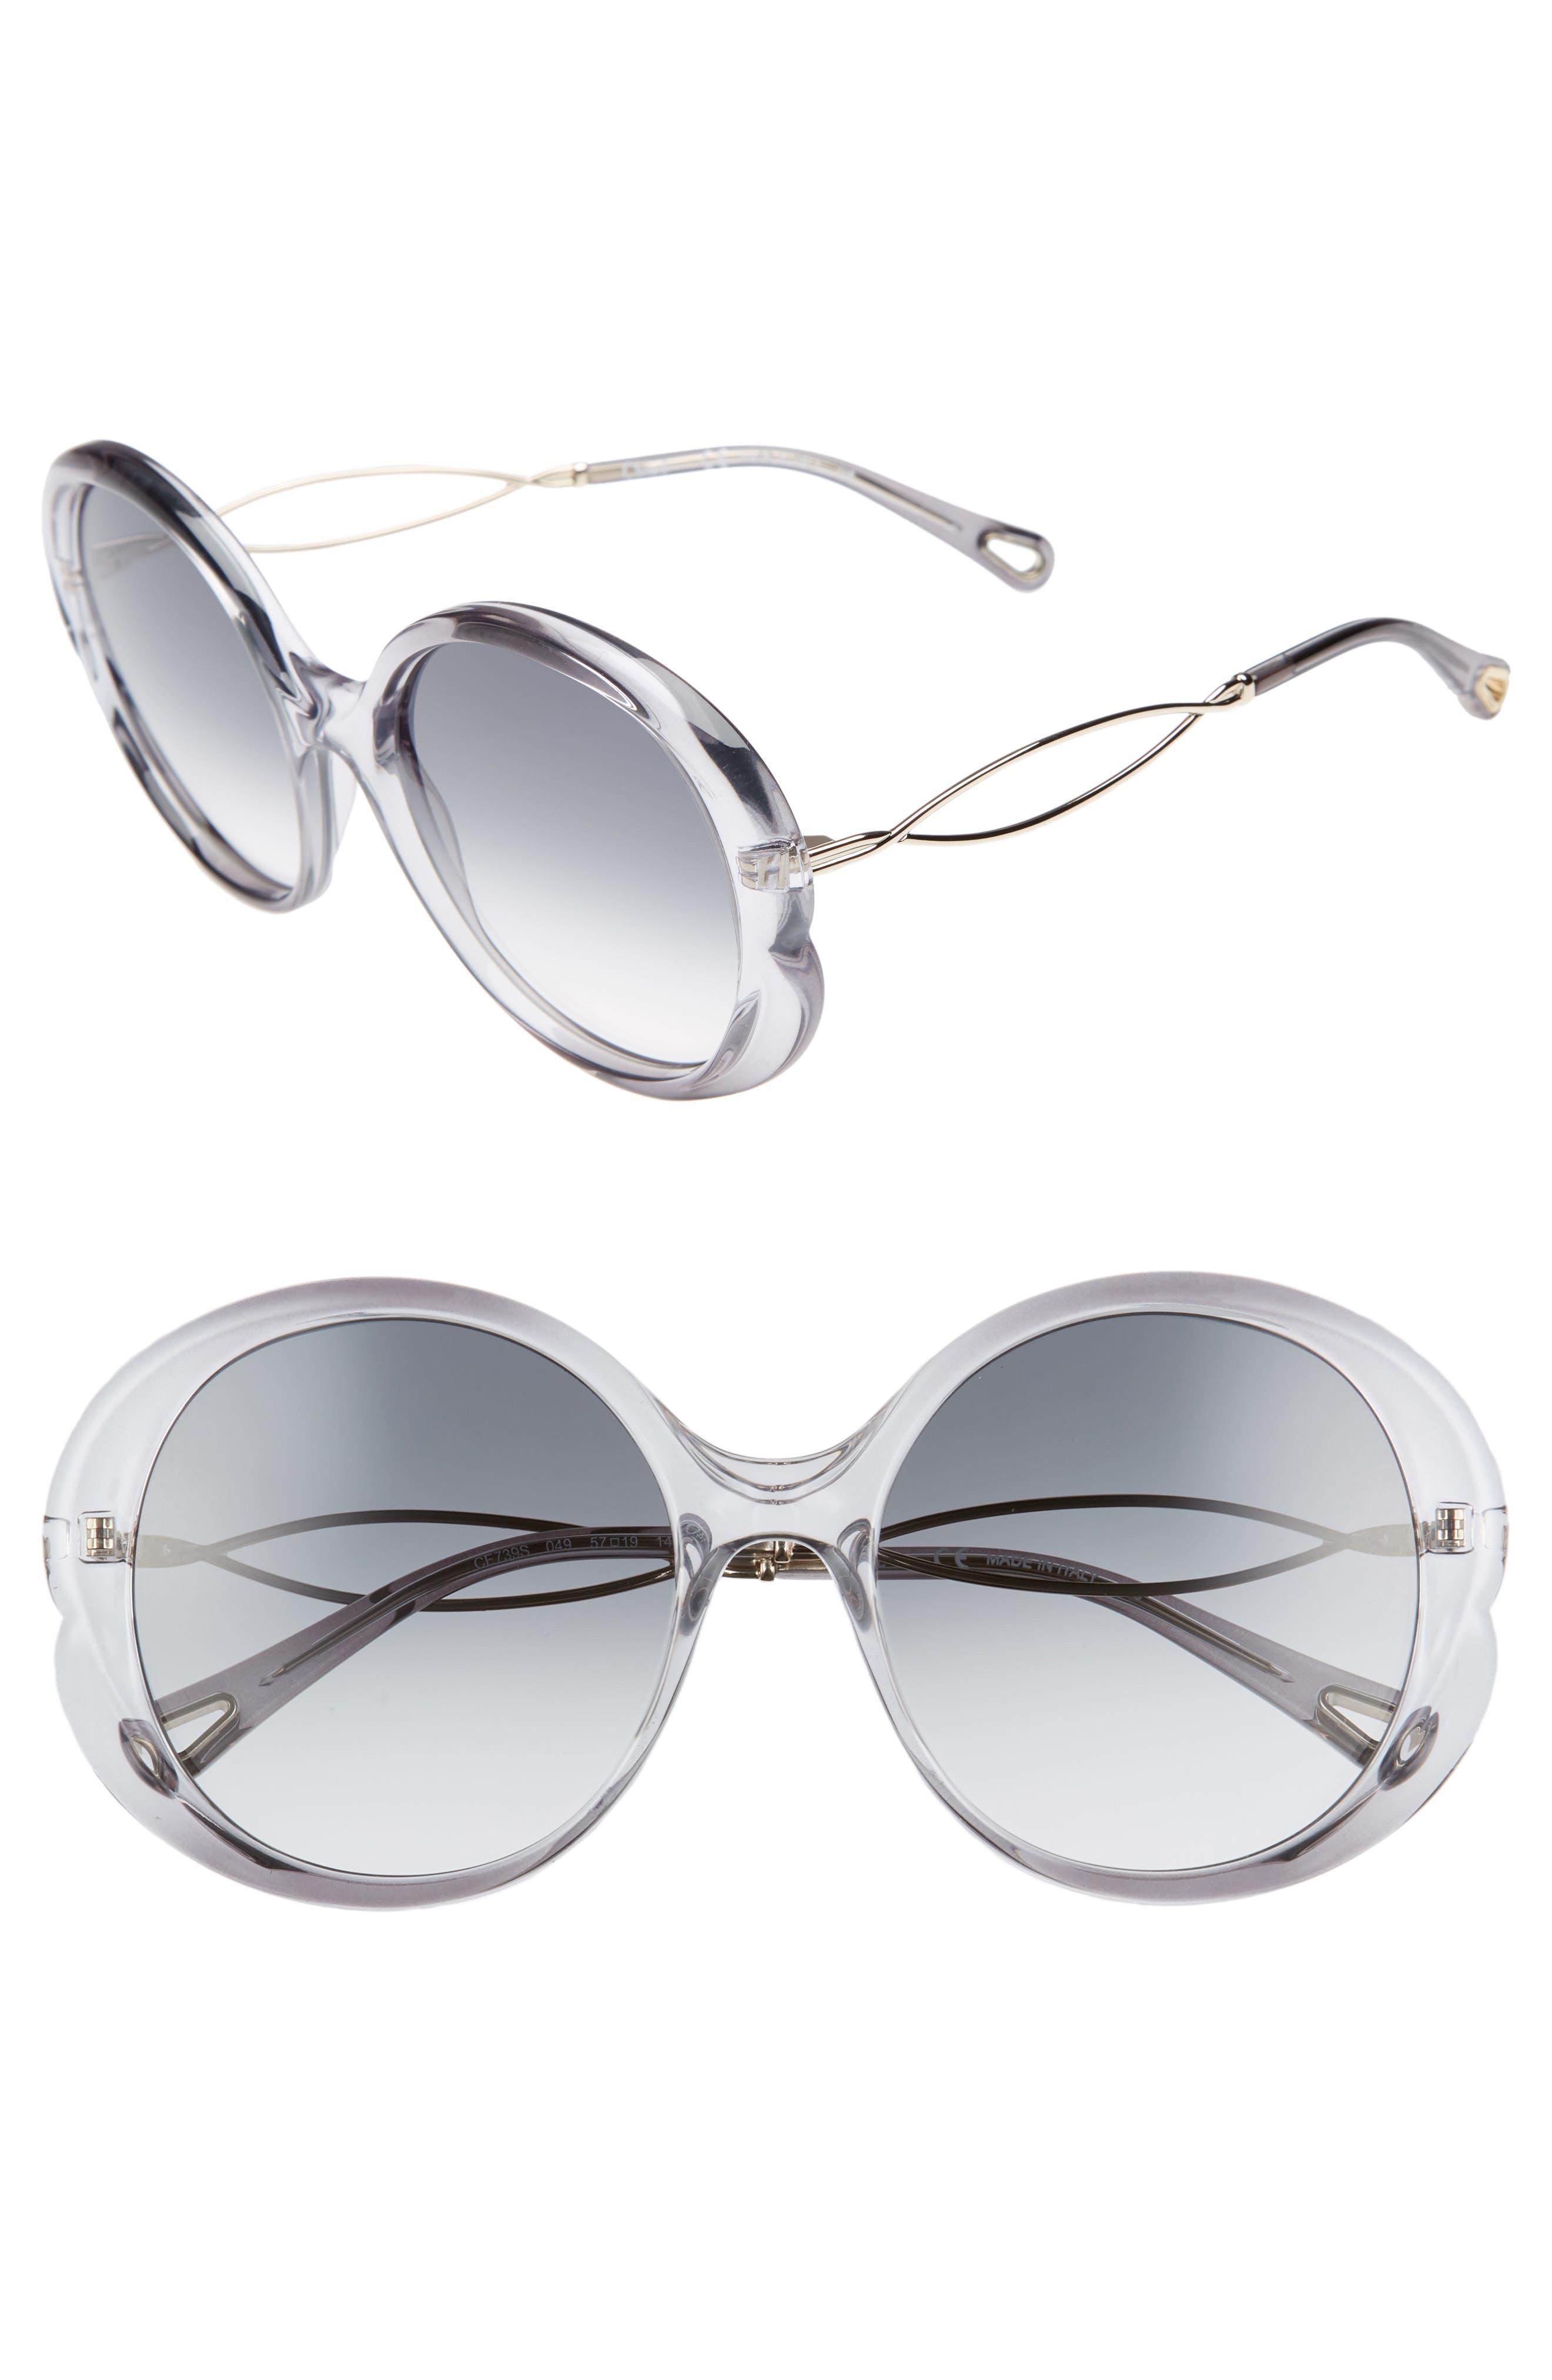 Petal 57mm Gradient Round Sunglasses,                             Main thumbnail 1, color,                             Grey/ Light Grey